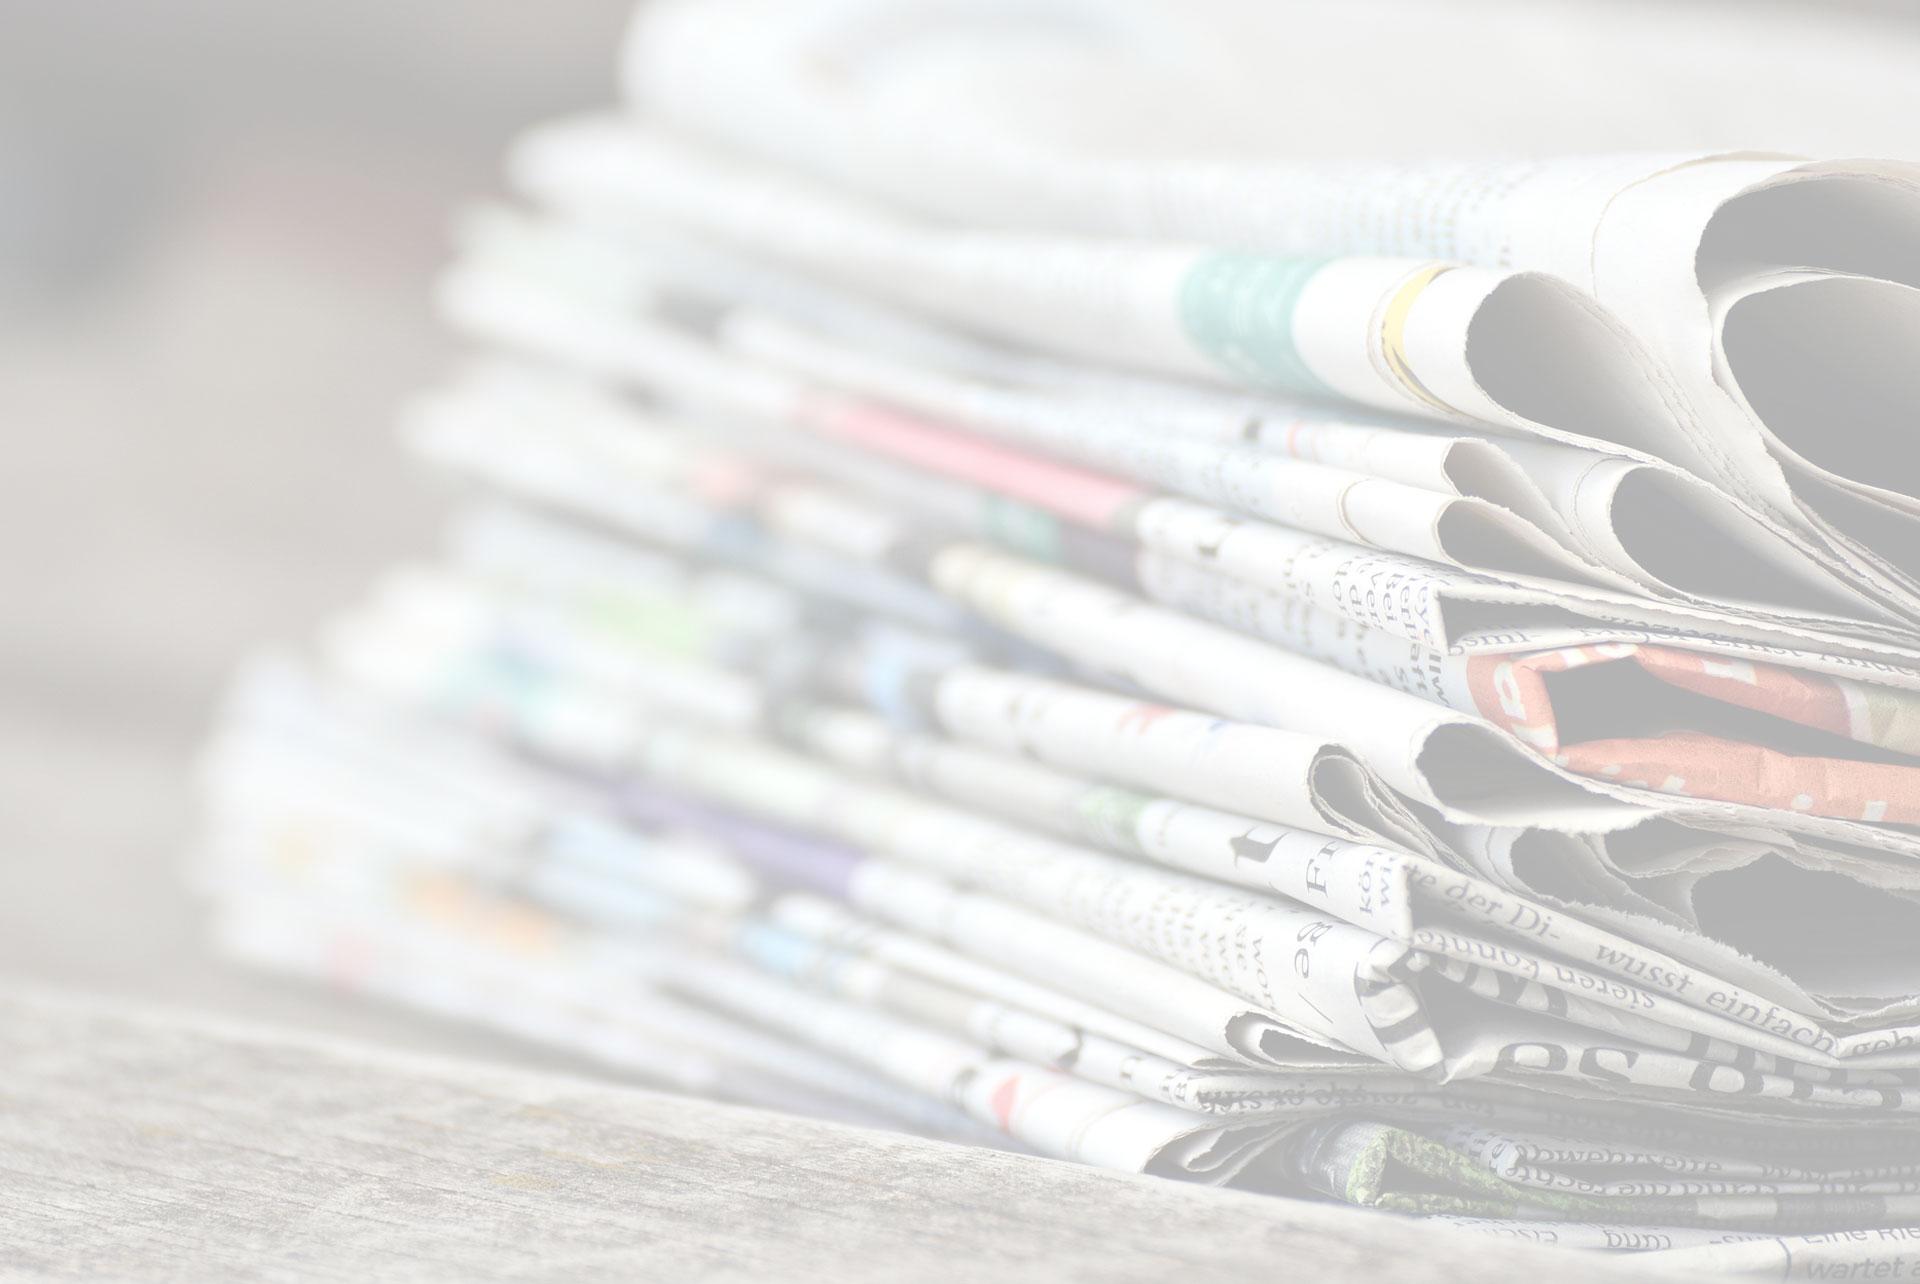 Matteo Salvini carabinieri